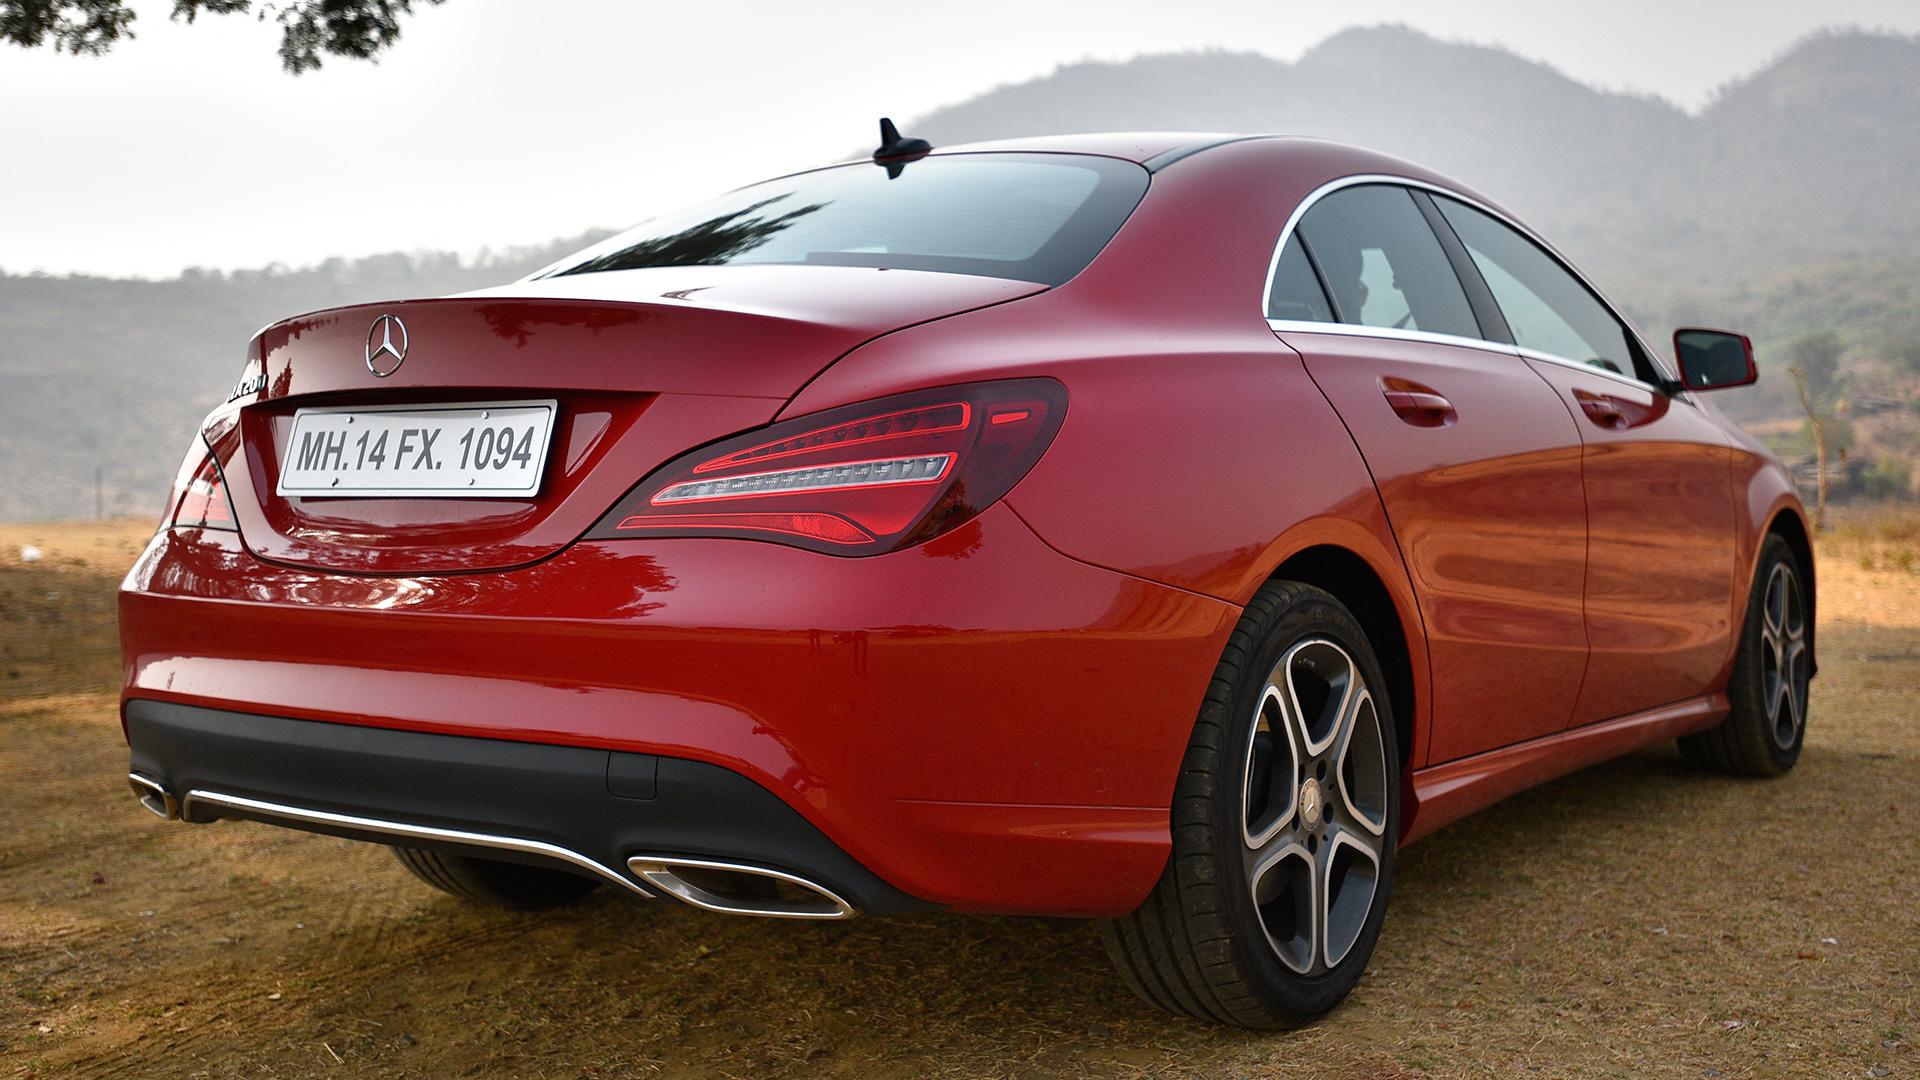 Mercedes Benz Cla 2017 200 Sport Price Mileage Reviews